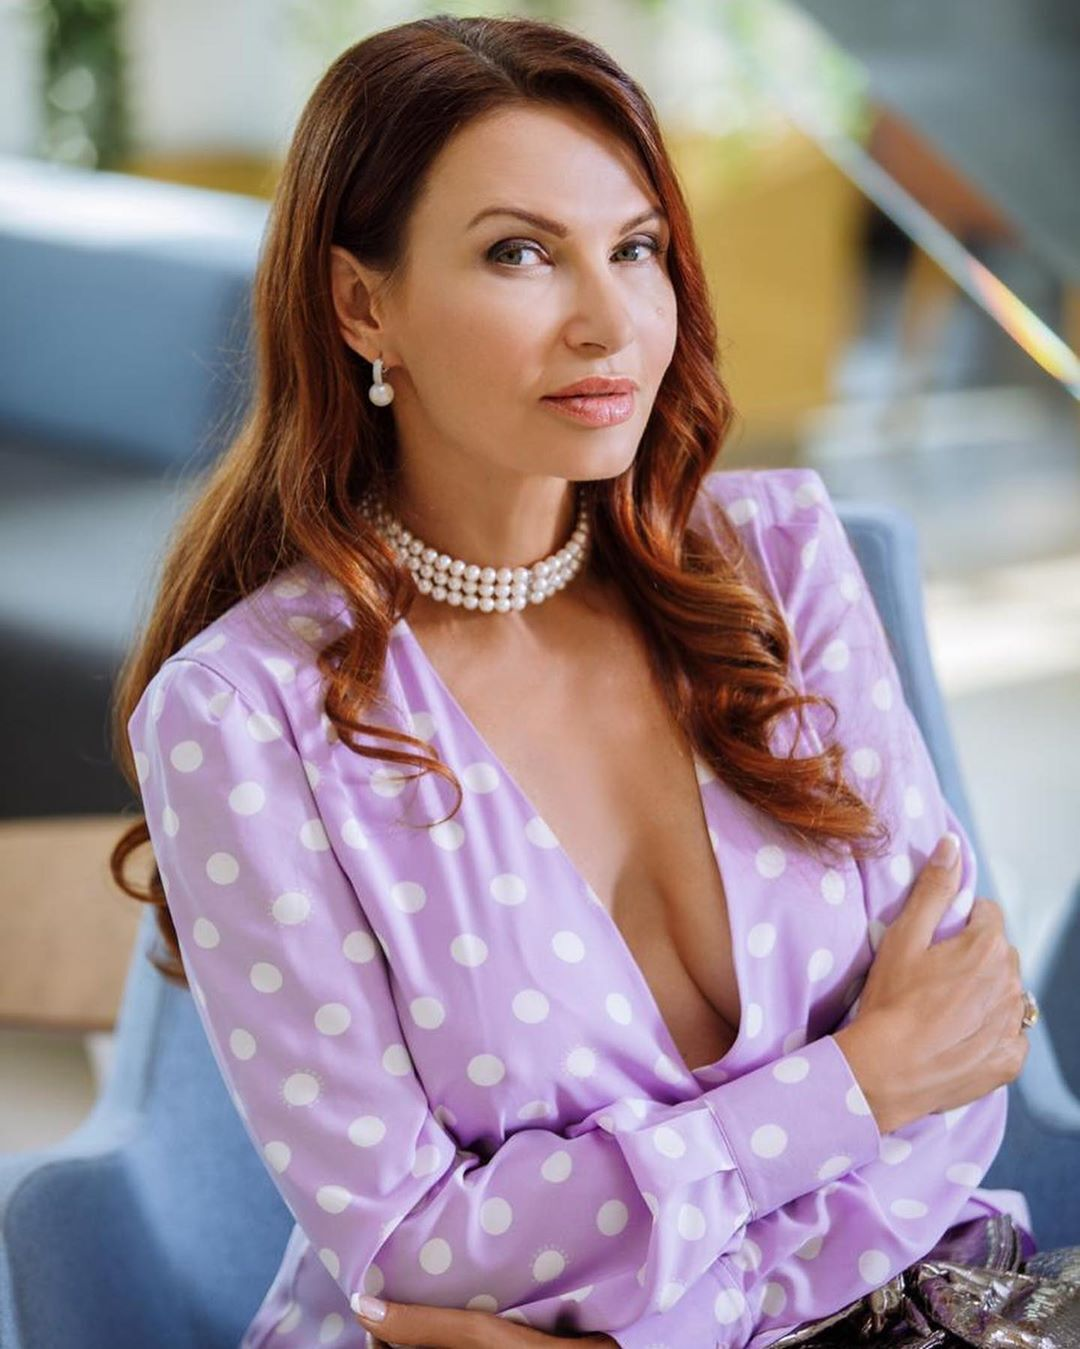 Евеліна Бльоданс